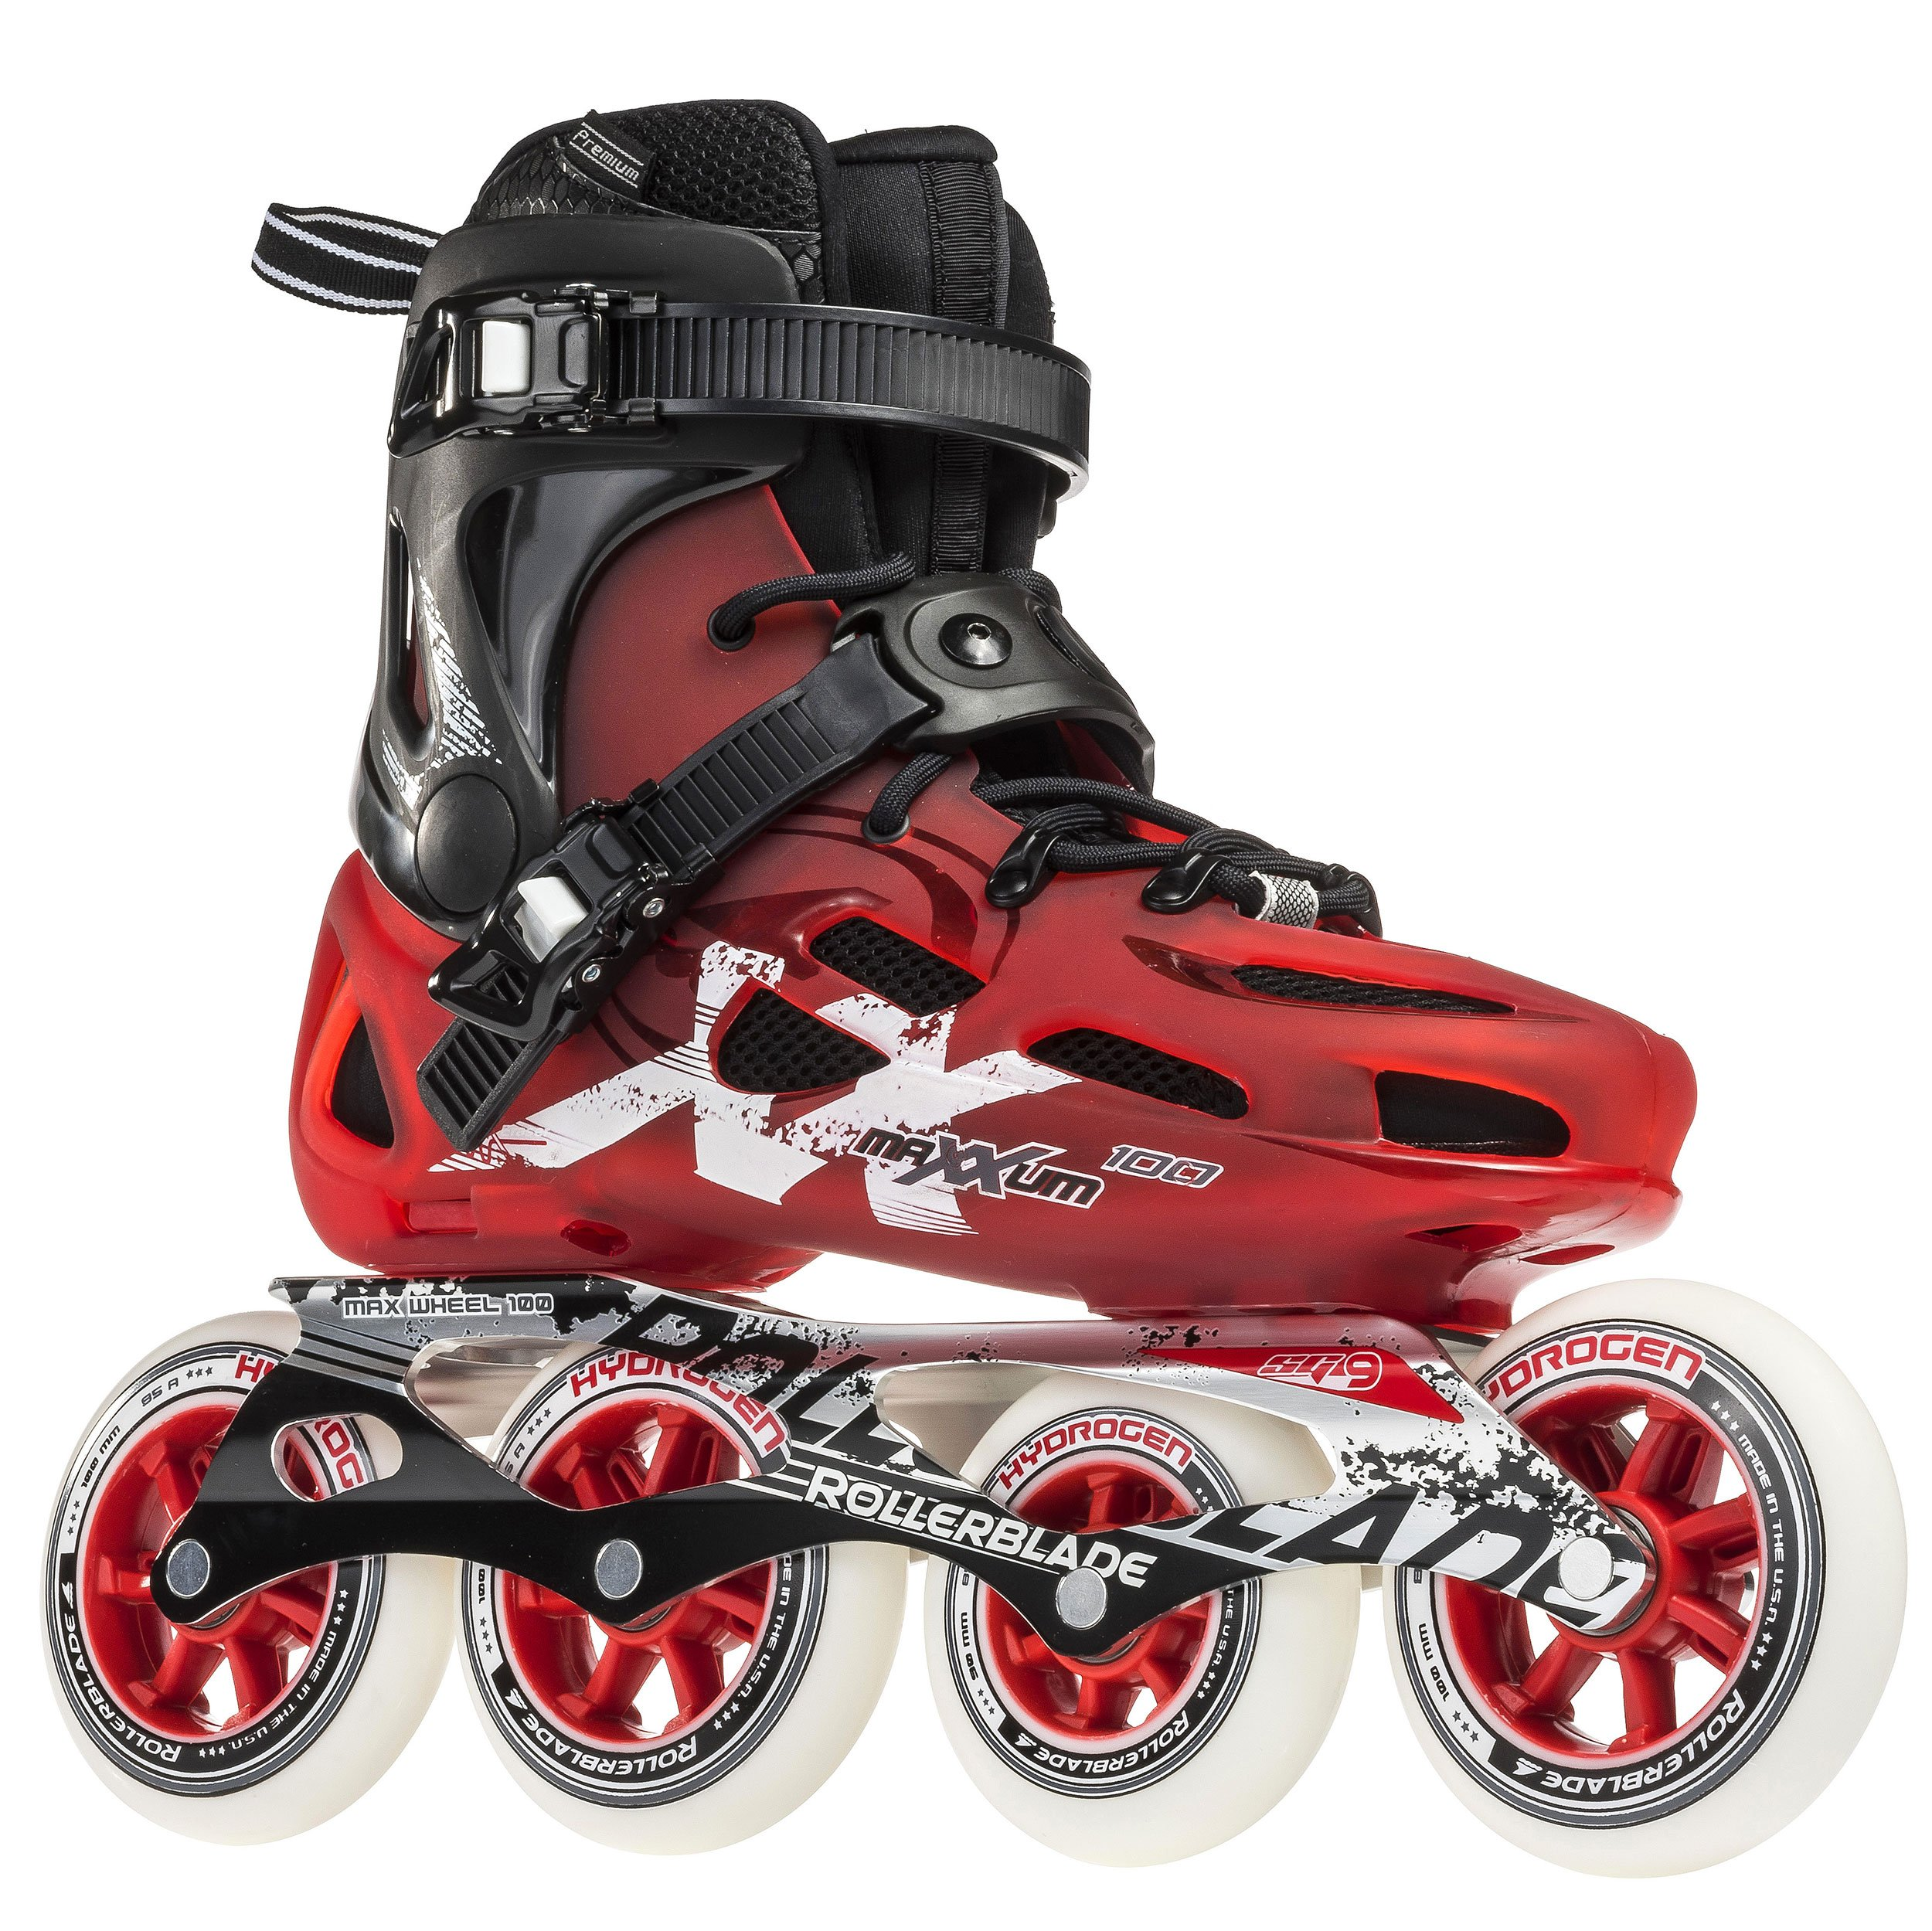 Rollerblade Maxxum 100 Unisex Adult Fitness Inline Skate